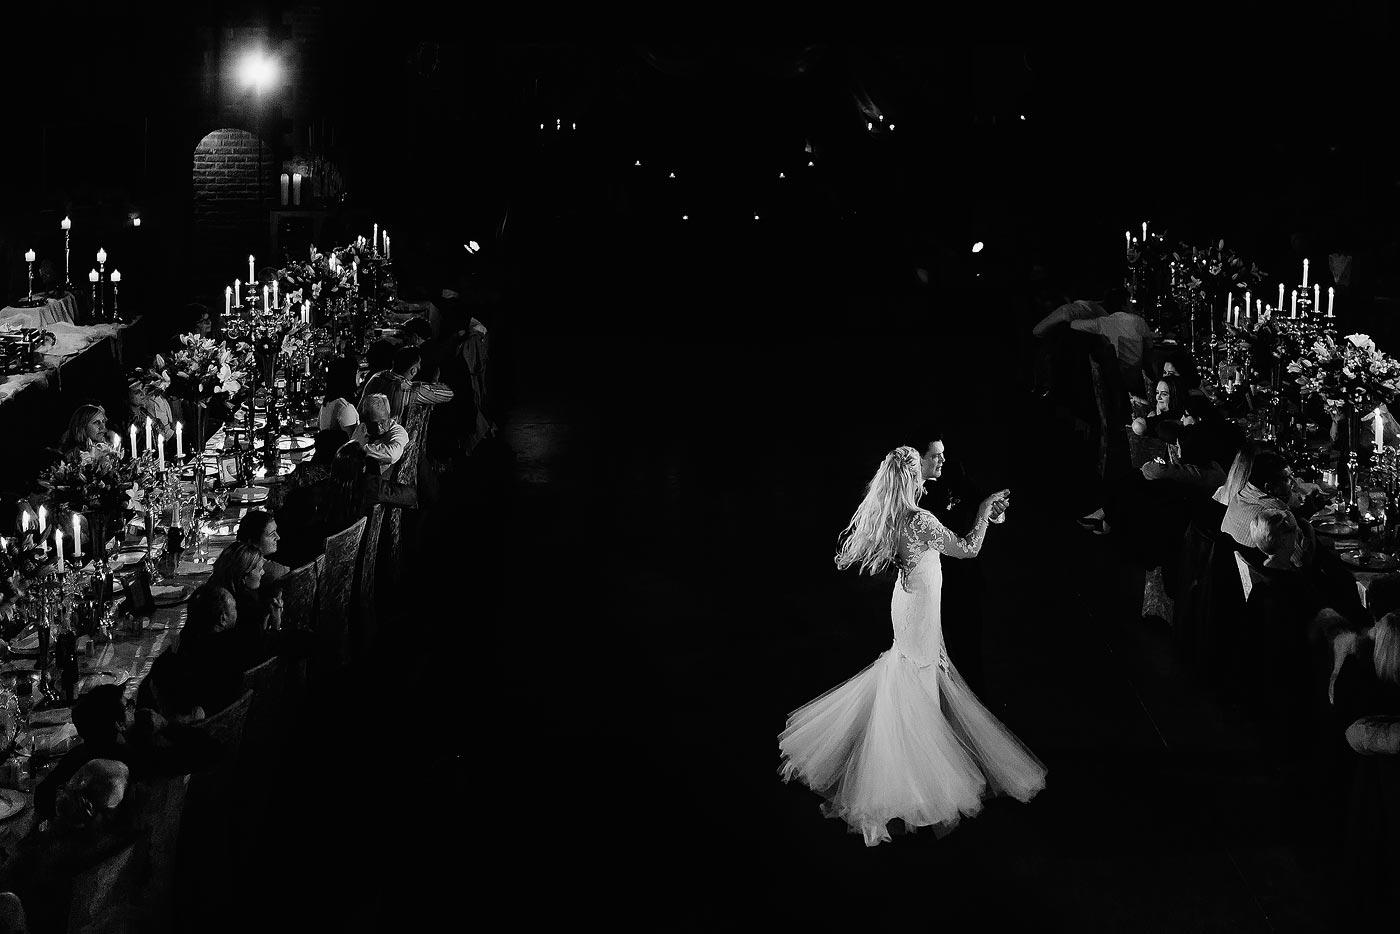 Elegant wedding first dance in castle wedding venue